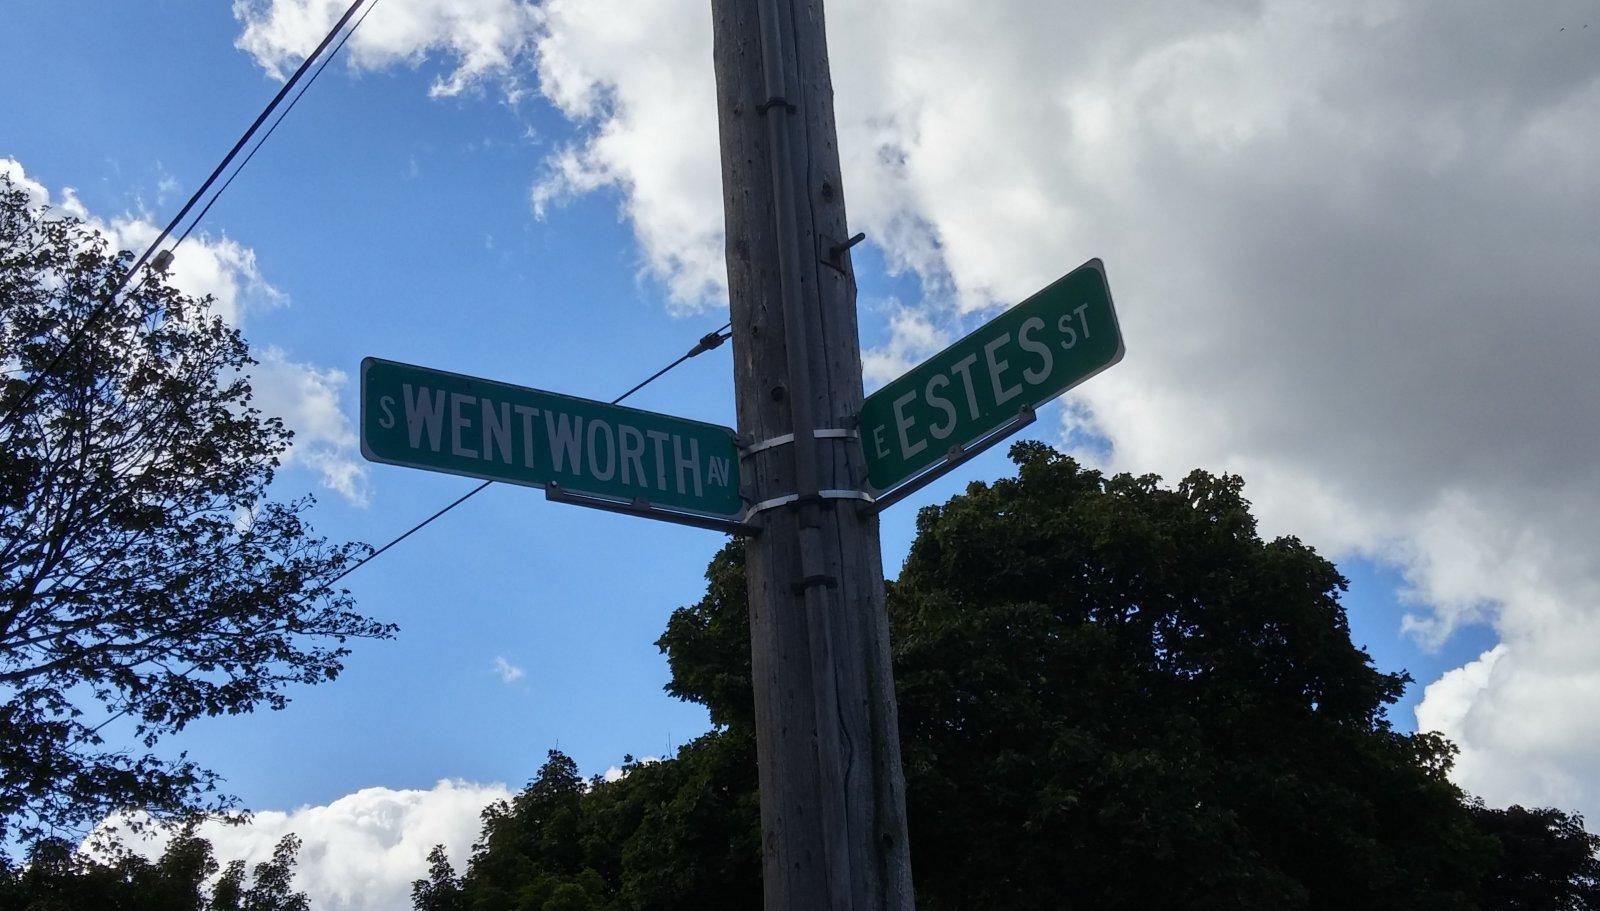 Intersection memorializing Elijah Estes and Zebiah Wentworth